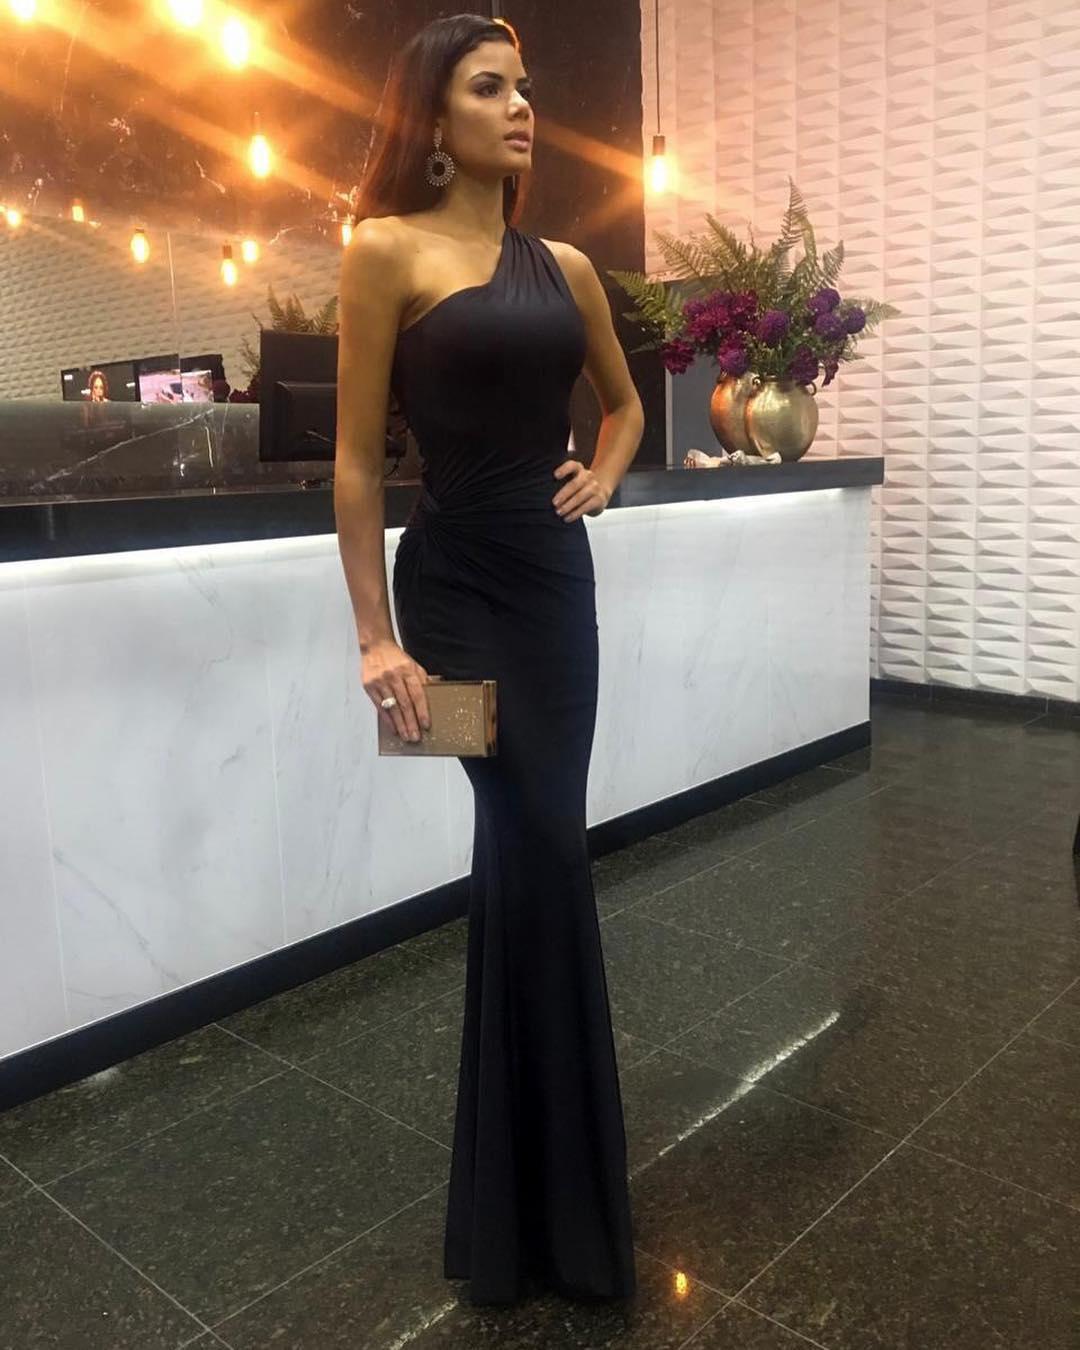 dagmara landim, top 10 de miss brasil universo 2019. - Página 2 50771310